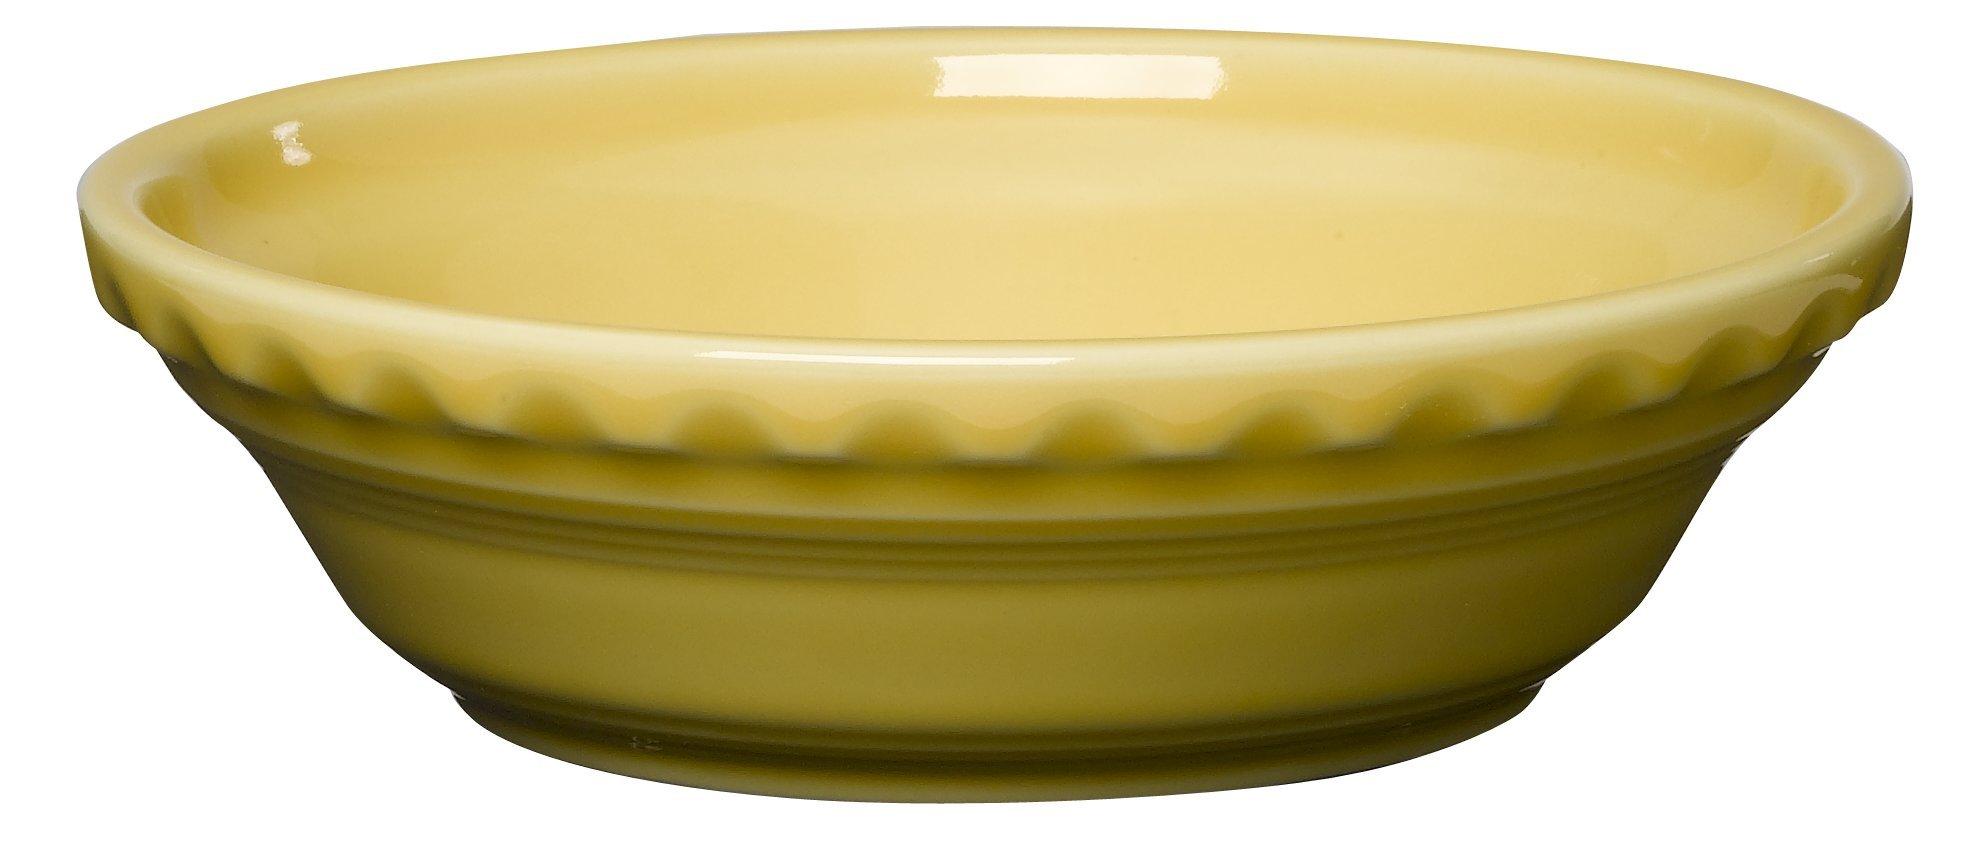 Fiesta 6-3/8-Inch Small Pie Plate, Sunflower